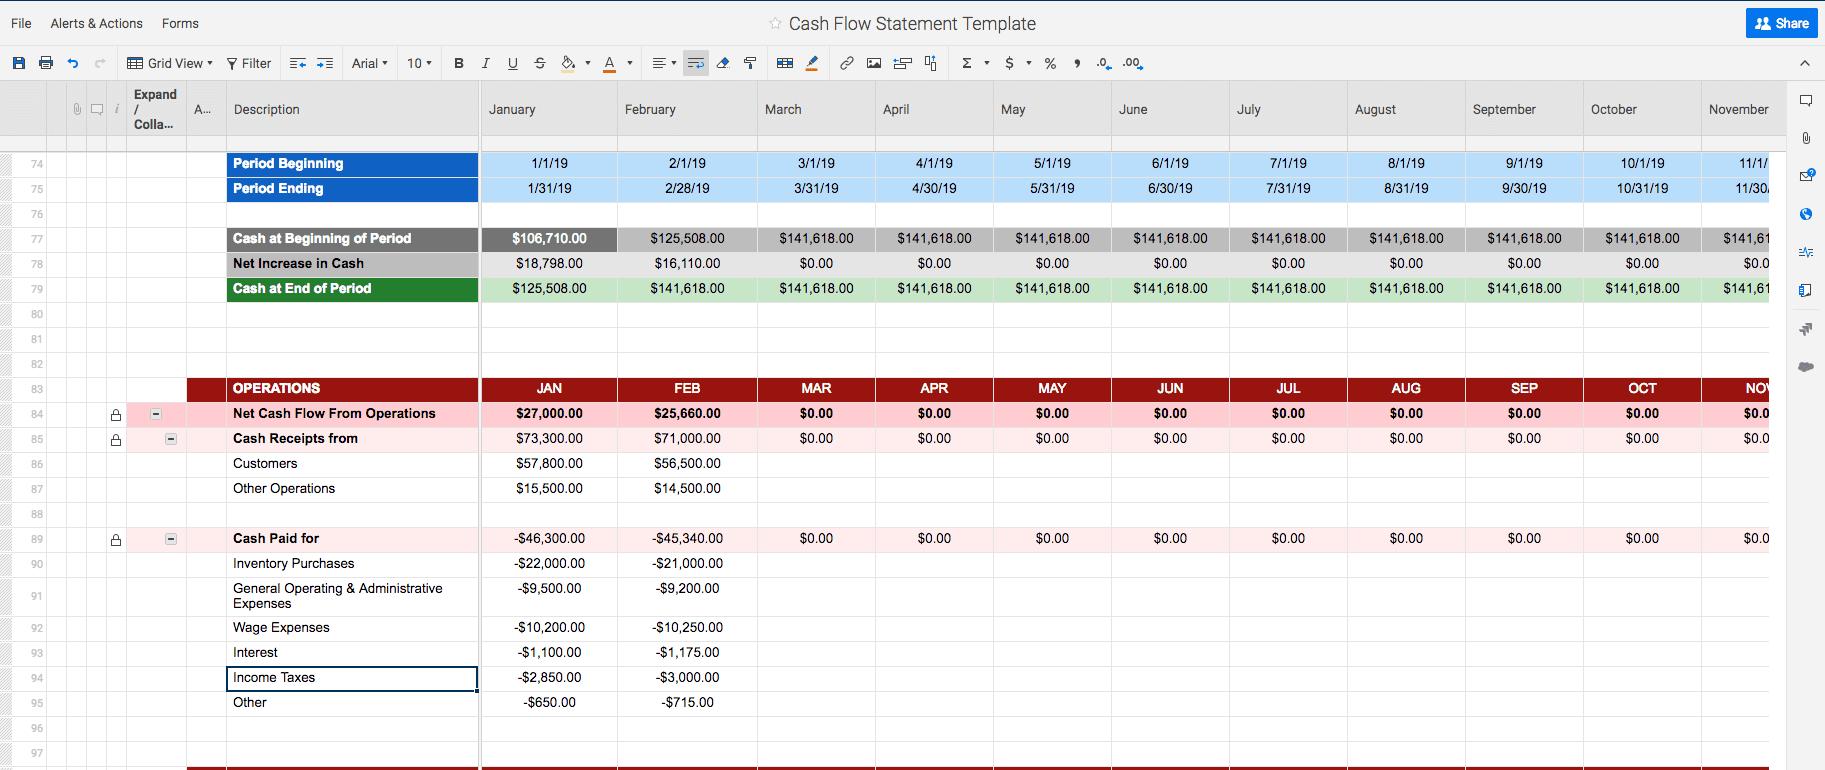 Free Cash Flow Statement Templates | Smartsheet Pertaining To Cash Position Report Template